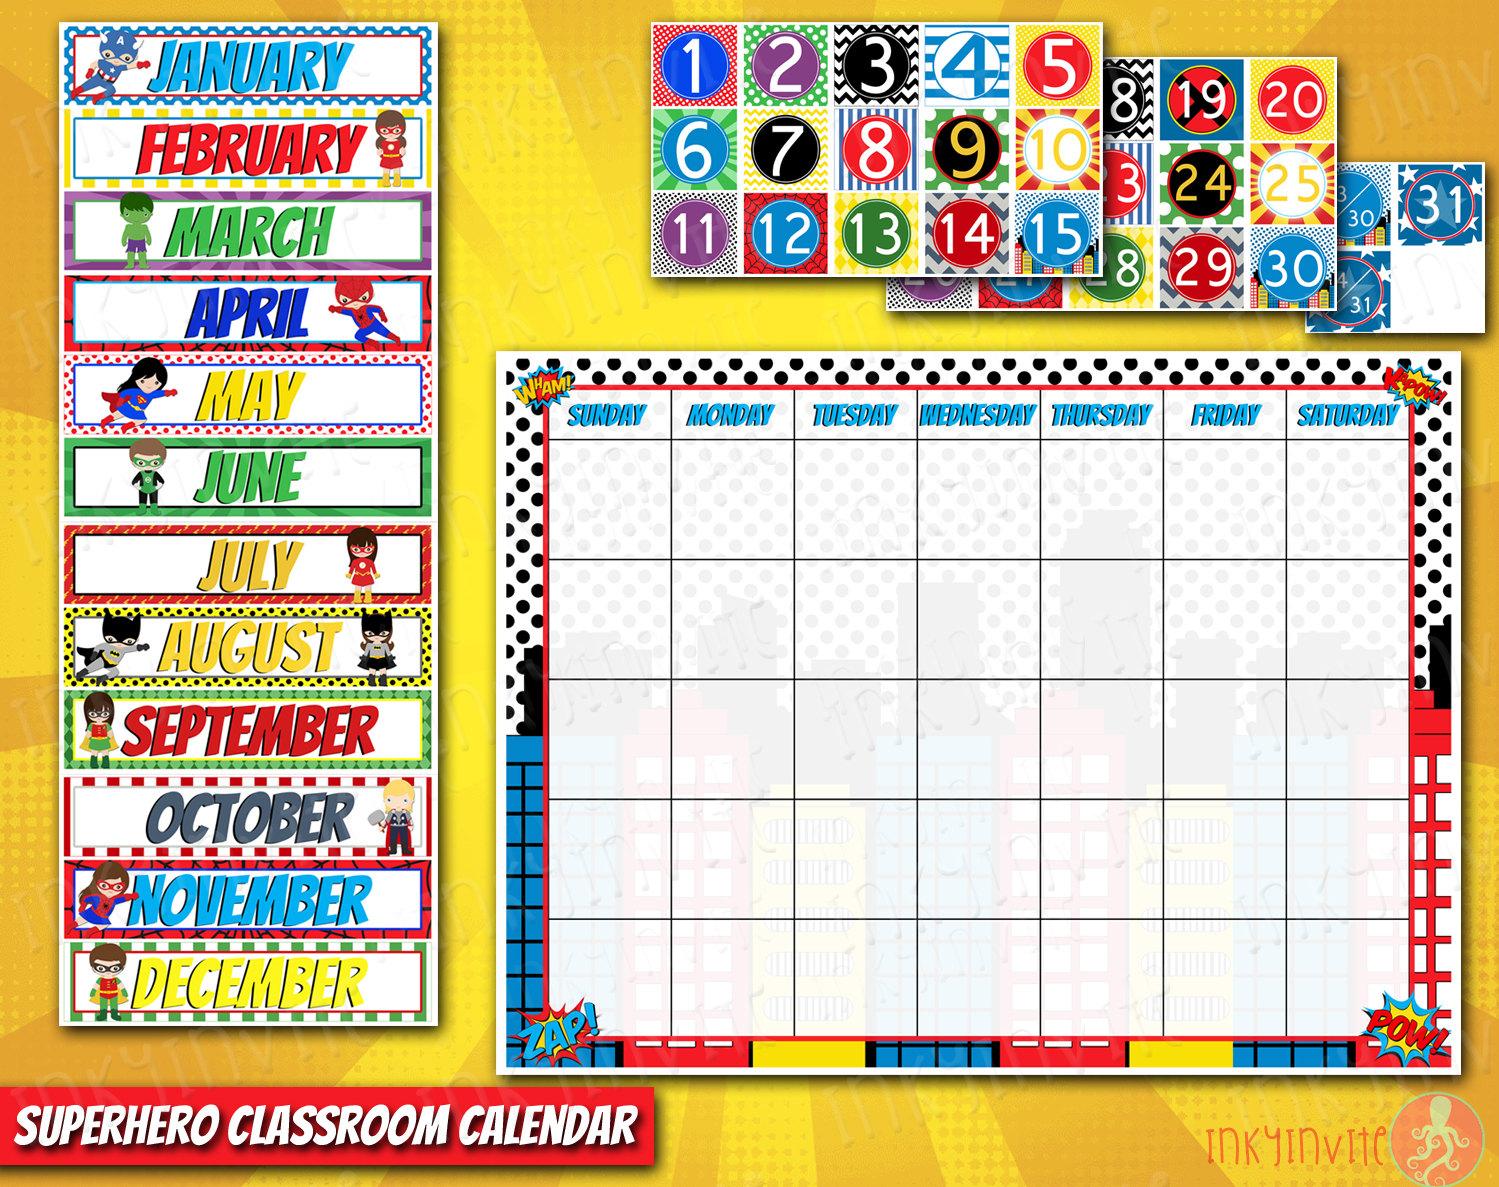 Calendar clipart classroom. Superhero pre school